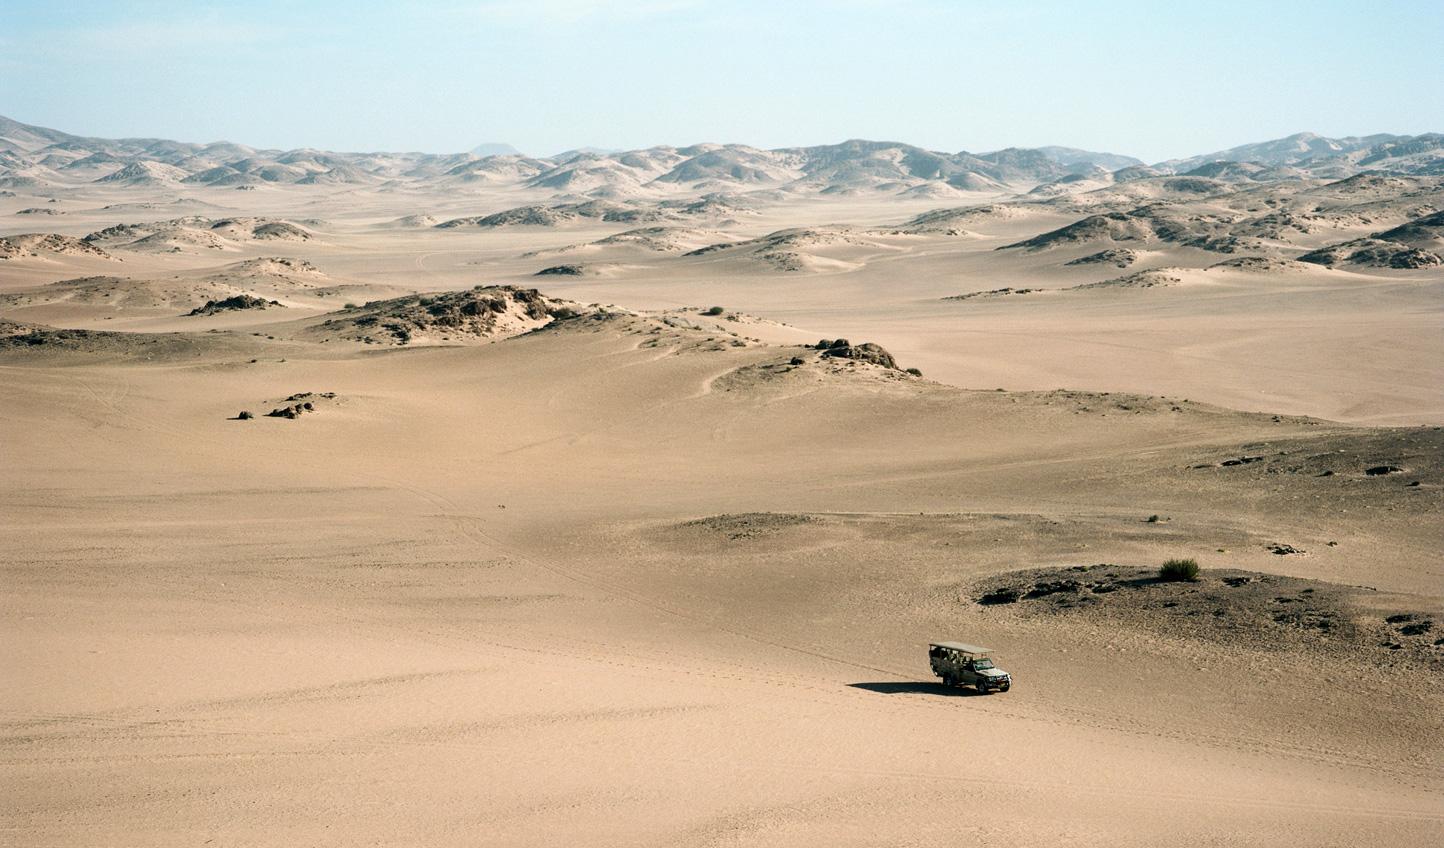 Drive across the dunes